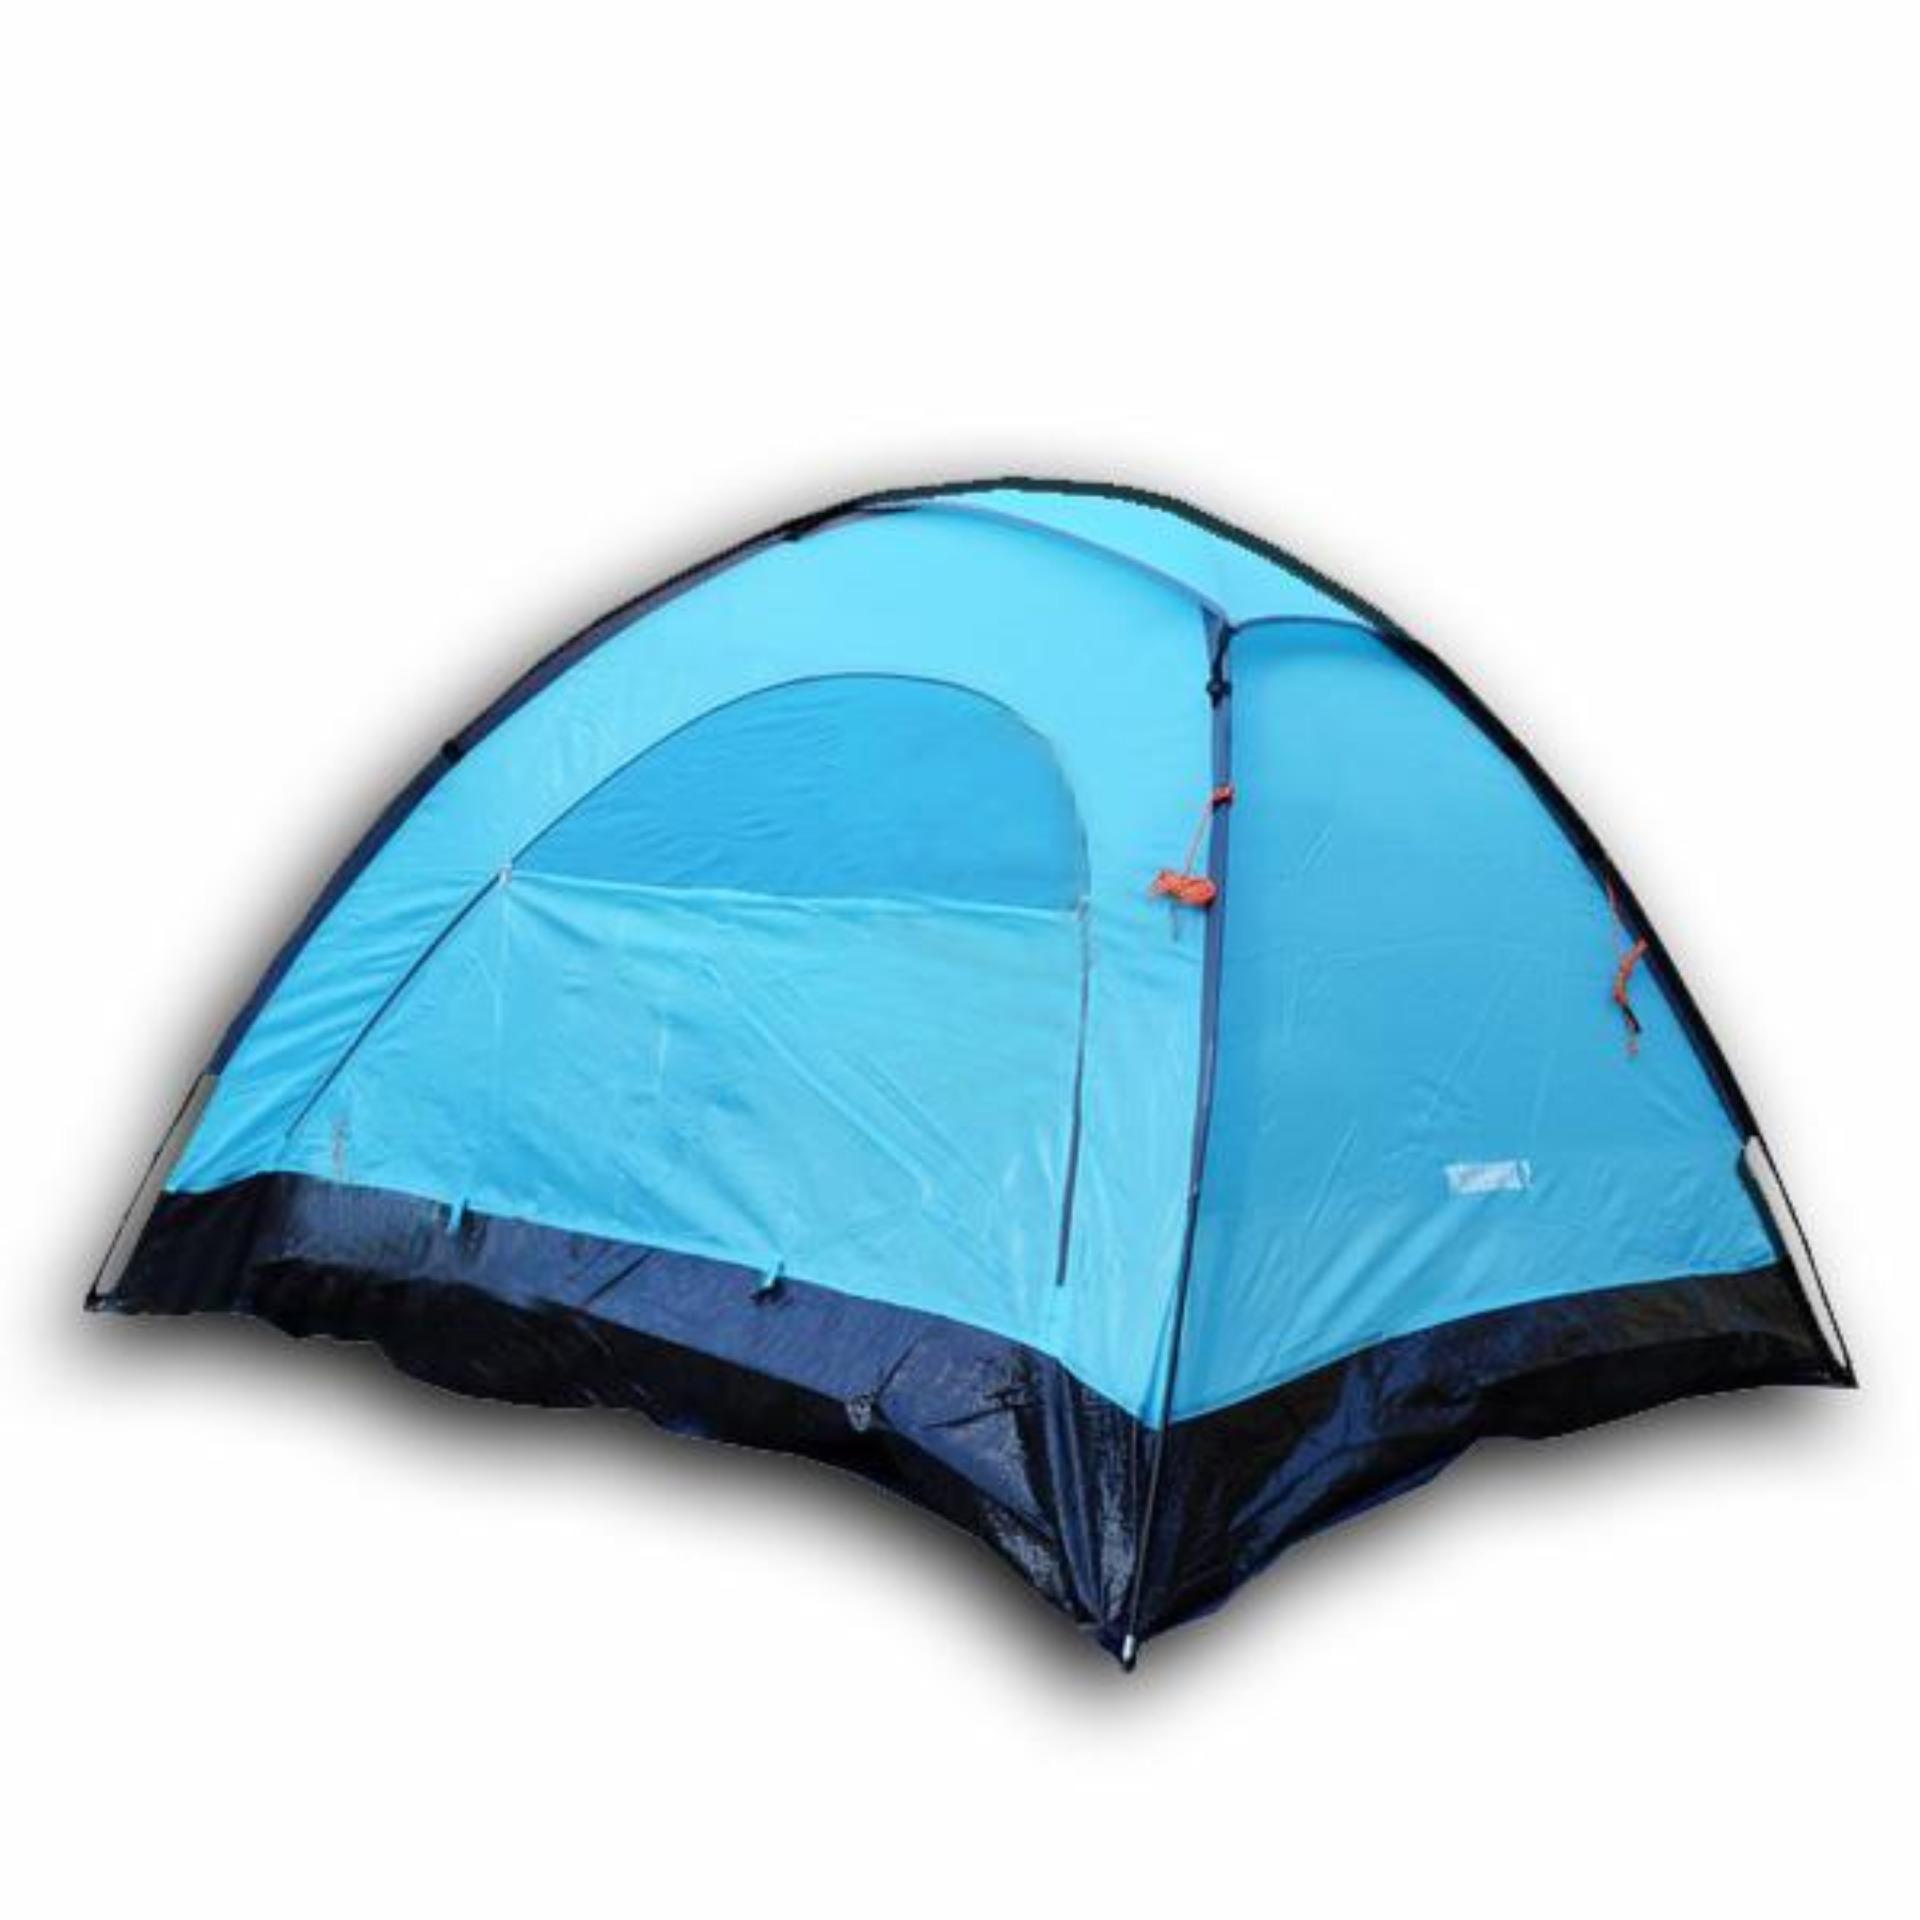 Tenda Great Outdoor Monodome Pro 2 3 Orang Daftar Harga Terkini Not Eiger Consina Lafuma Elite Compss The North Face Besway Pavillo Montana Rei Mountain Hard Ware Camping